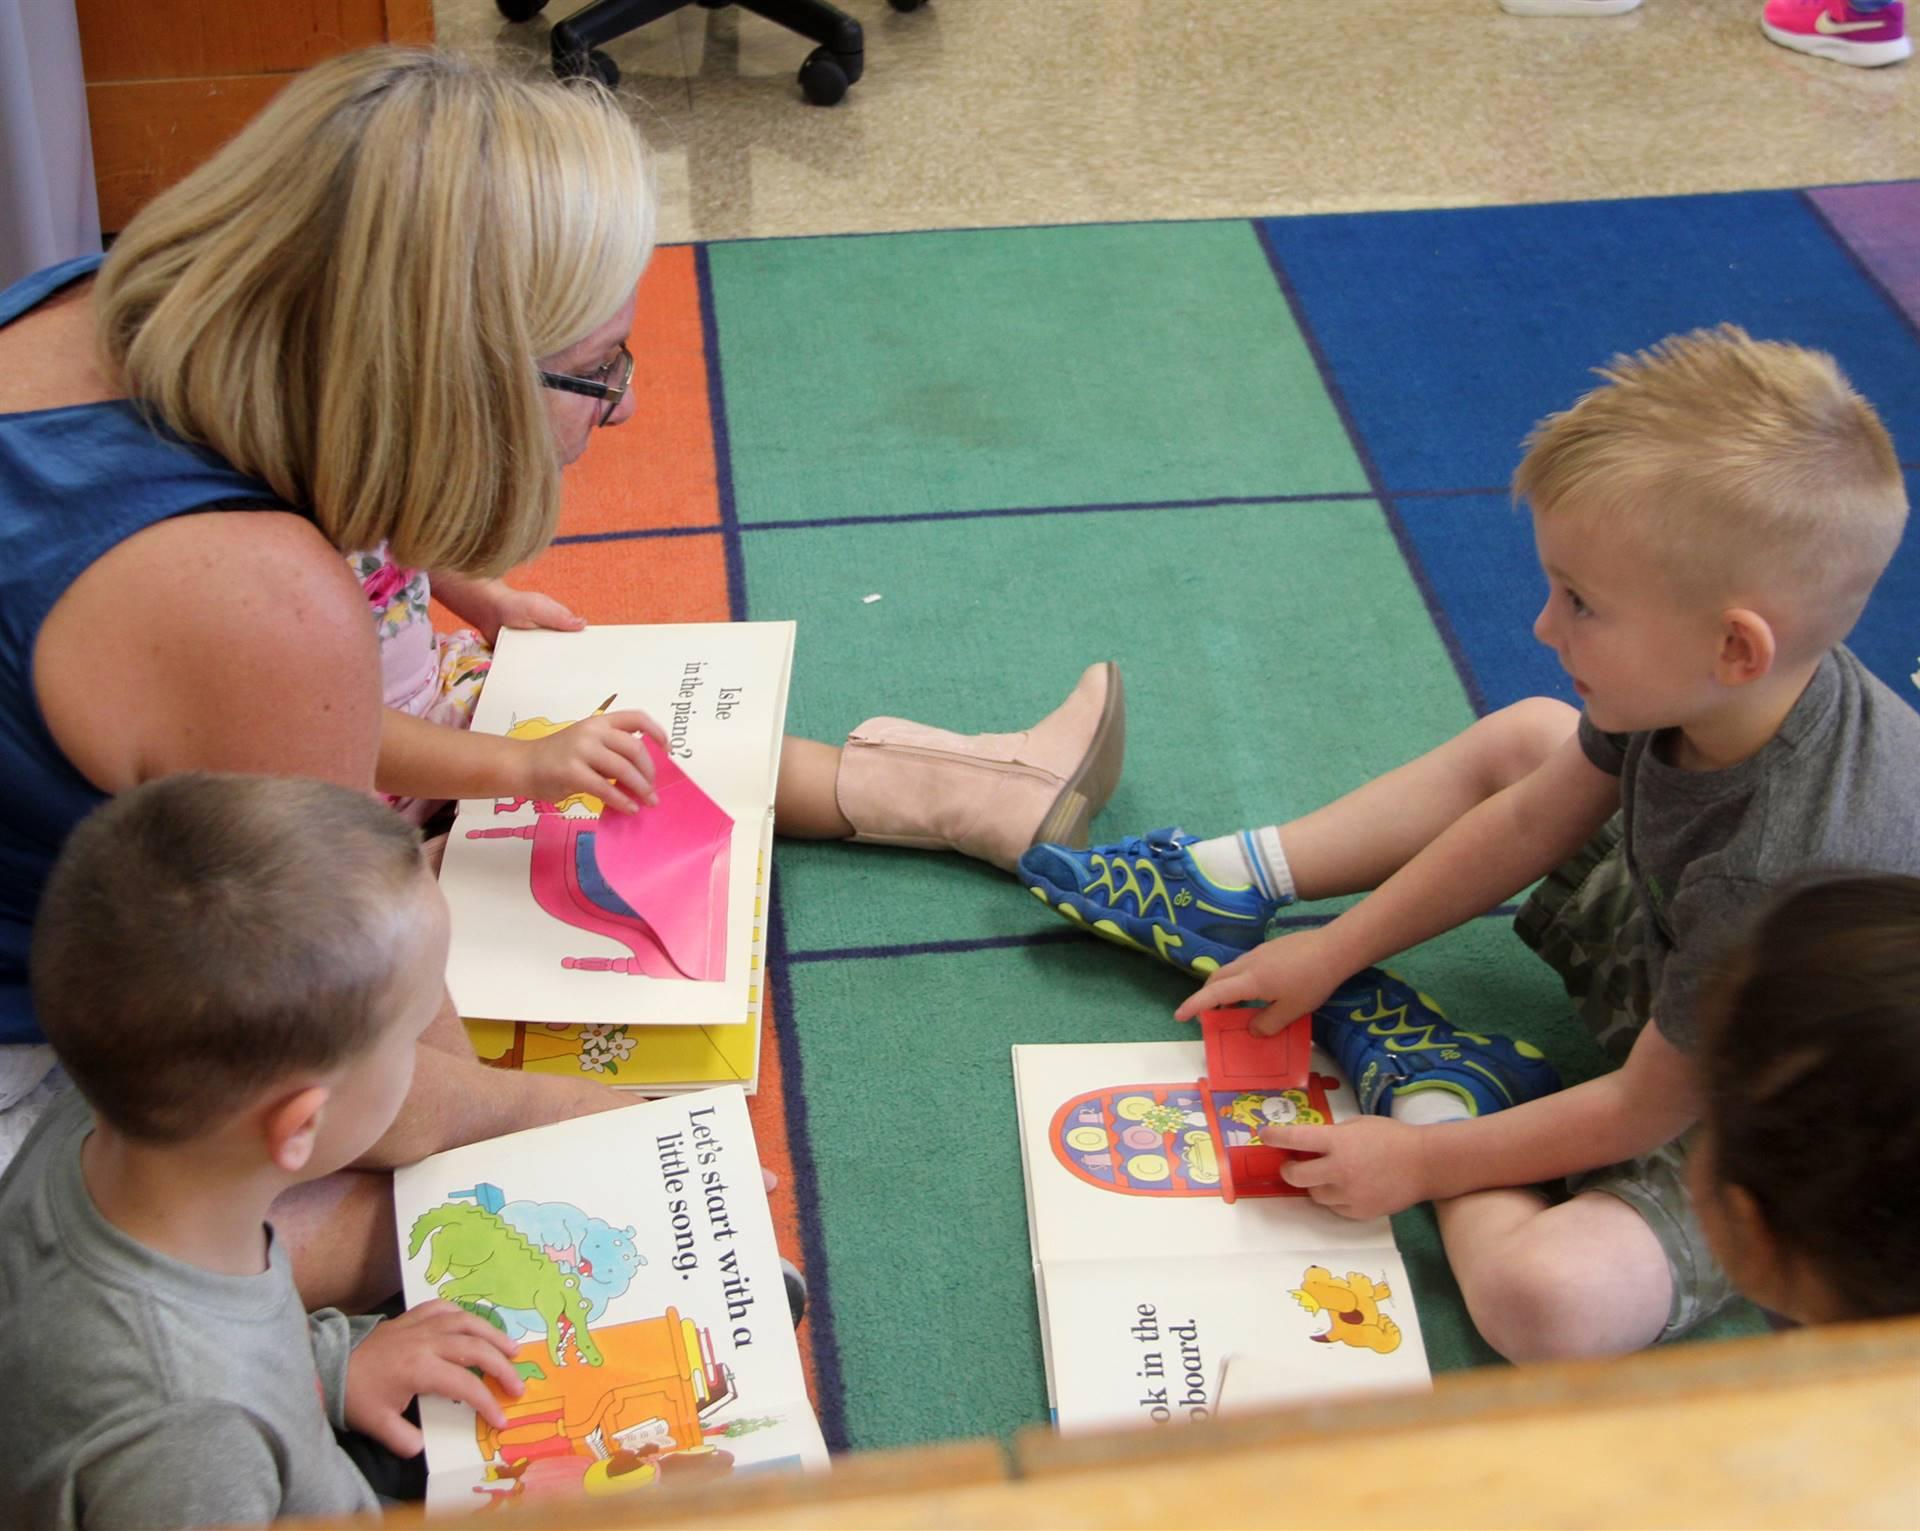 teacher speaking to student